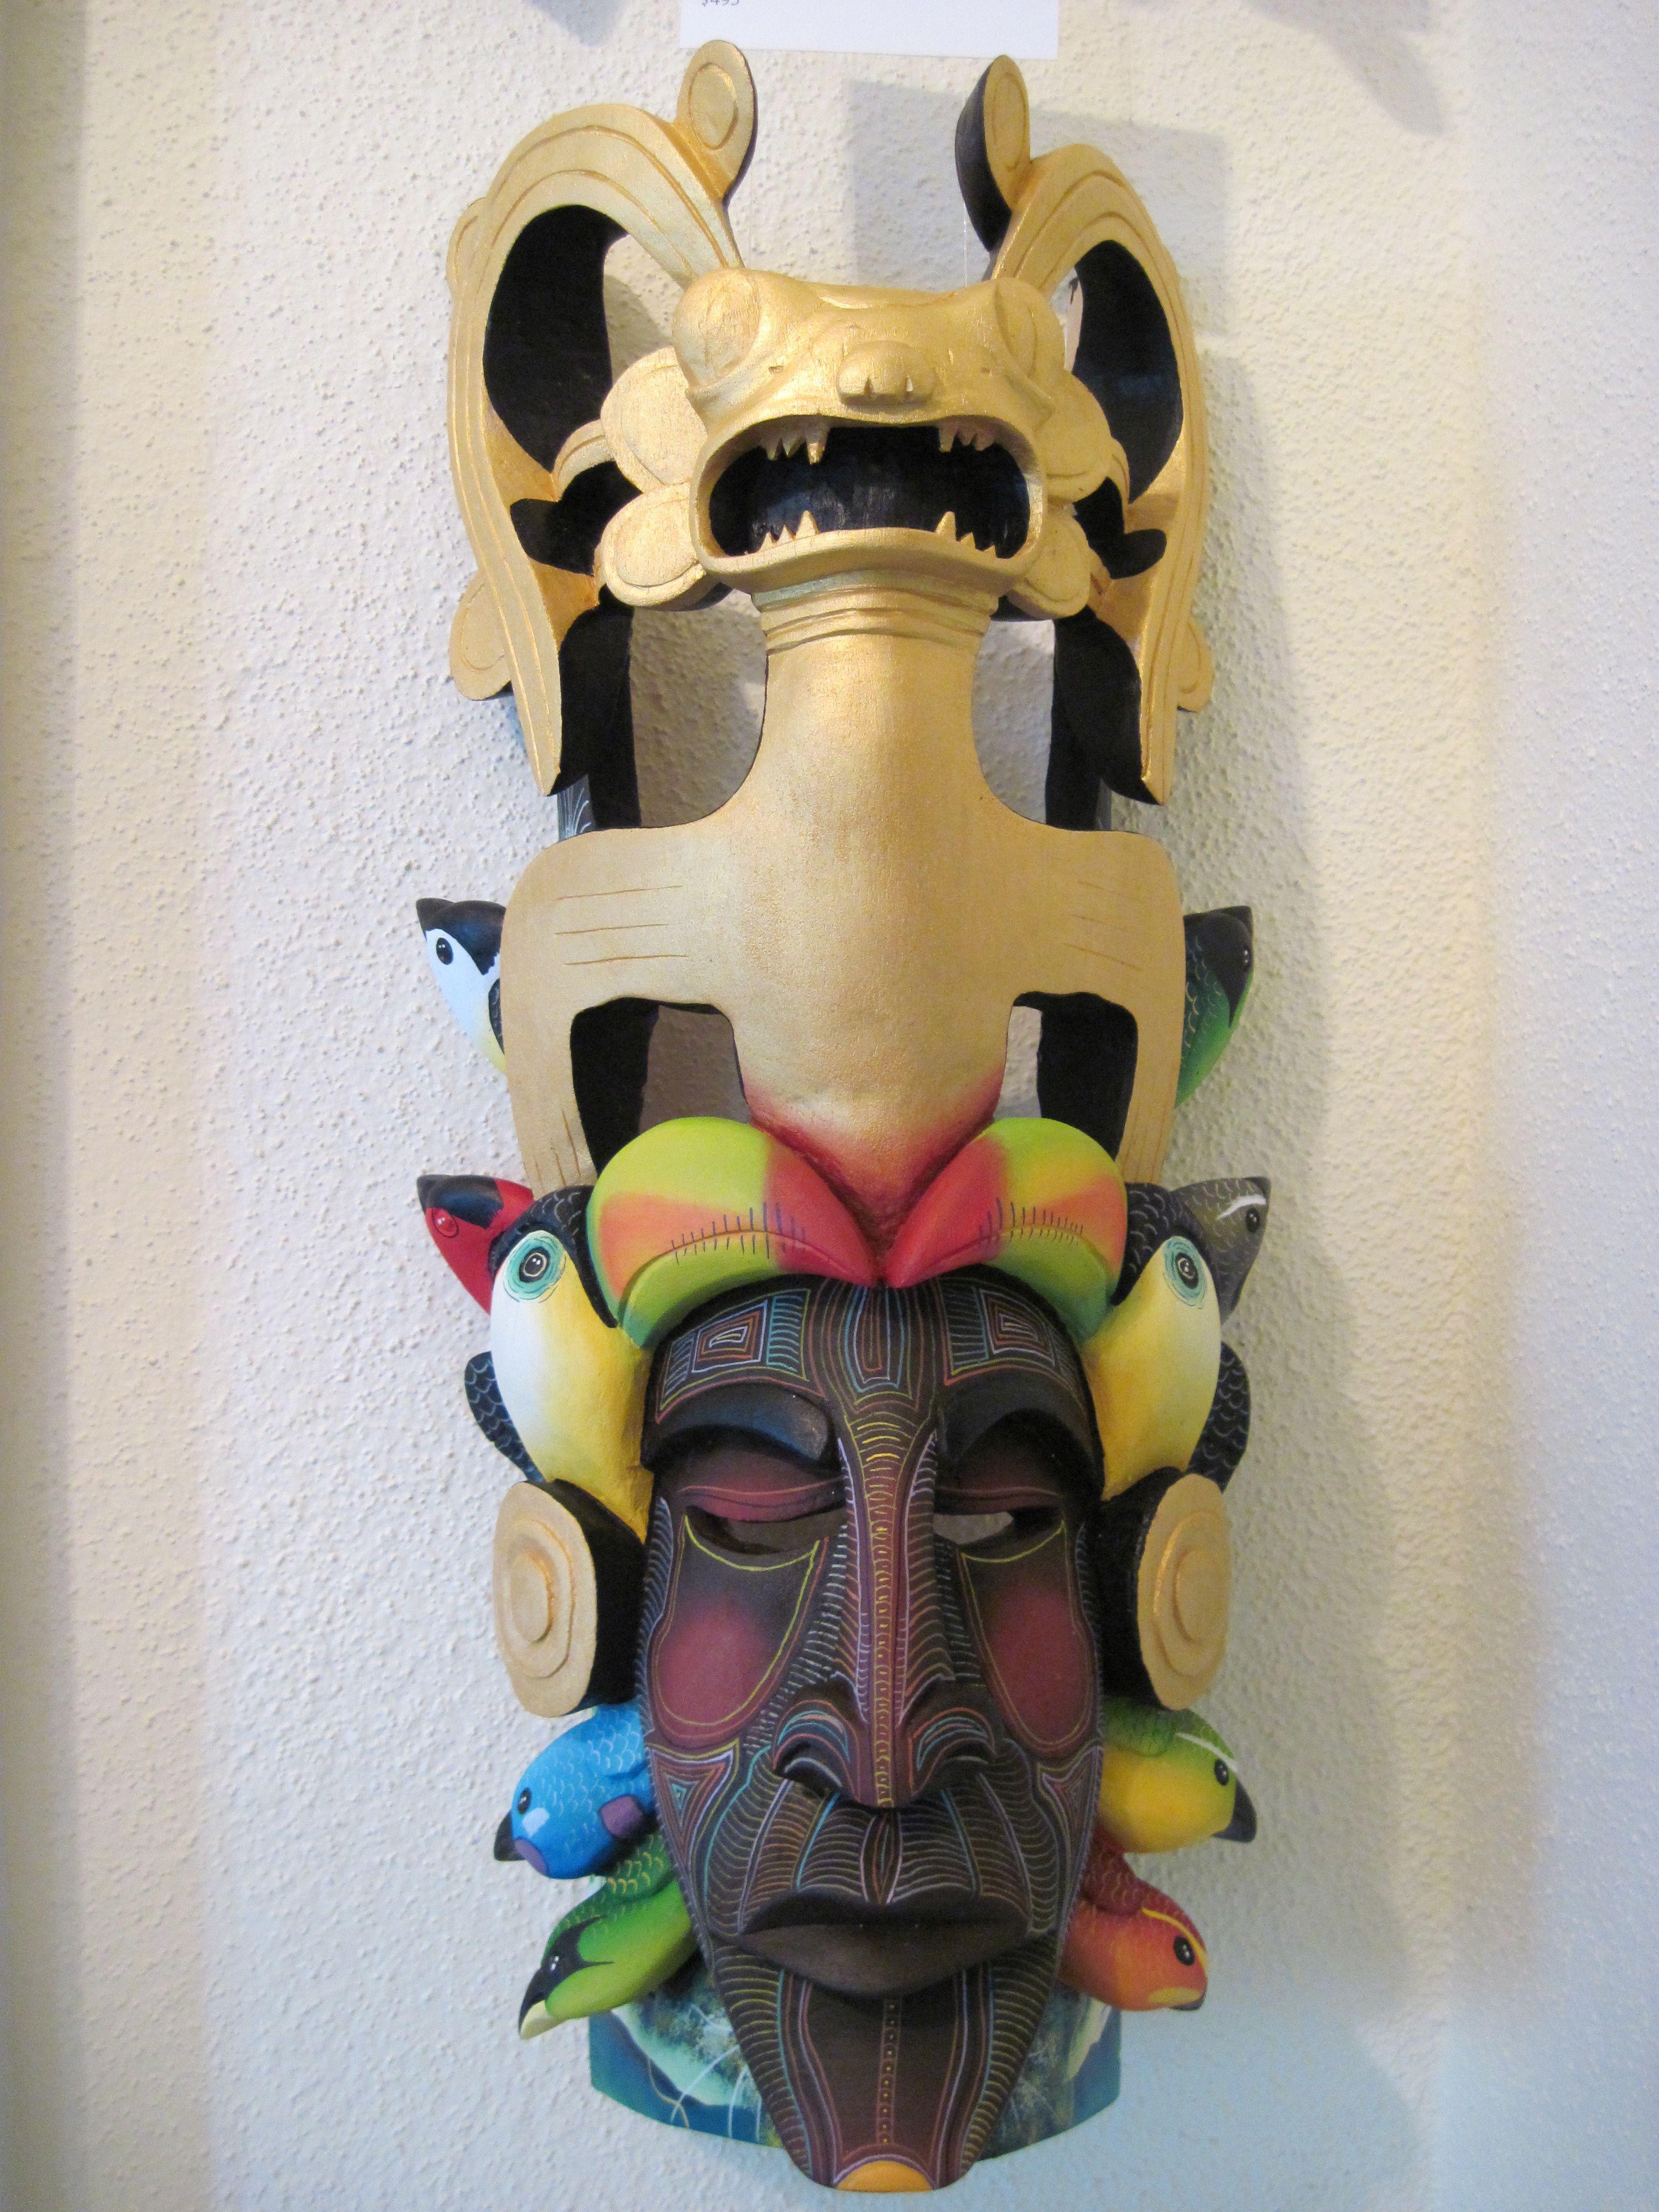 Golden Aztec Crown by Bernardo Gonzales Morales (photo by Judy Bell 2010 495)